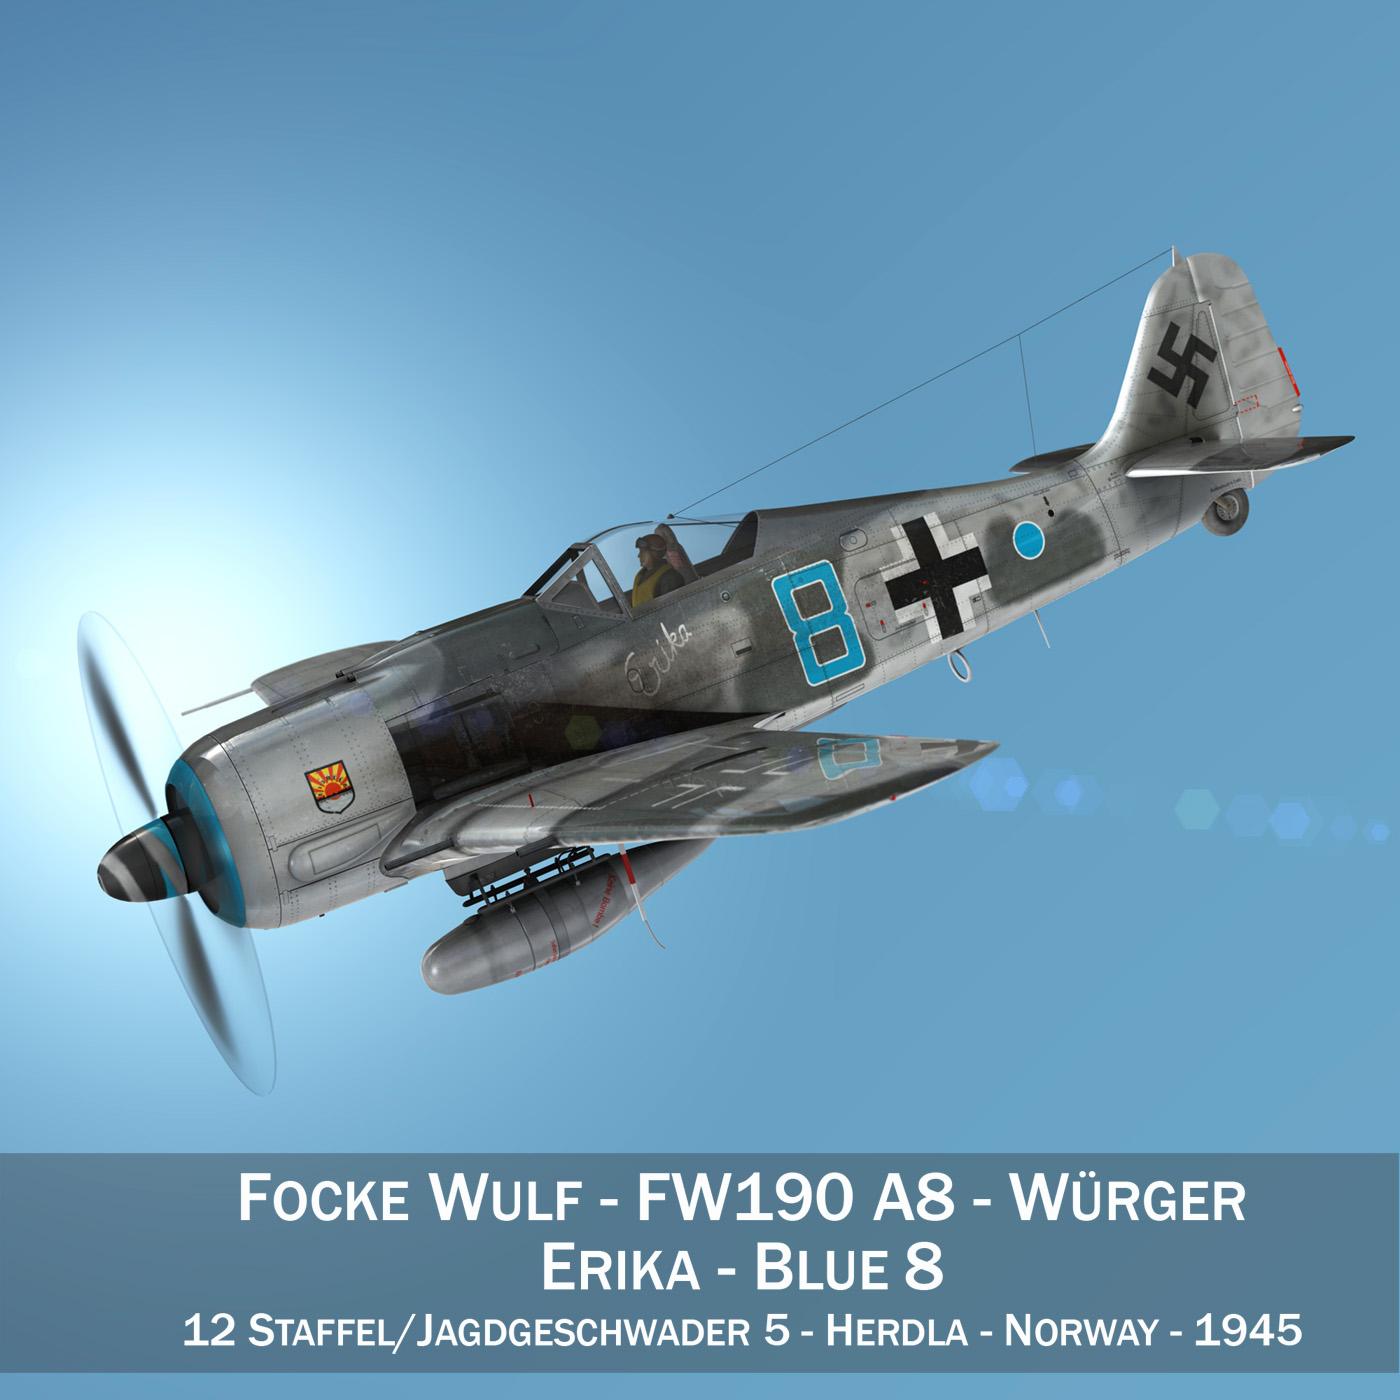 Focke Wulf - FW190 A8 - Blue 8 3d model 3ds fbx c4d lwo lws lw obj 293542